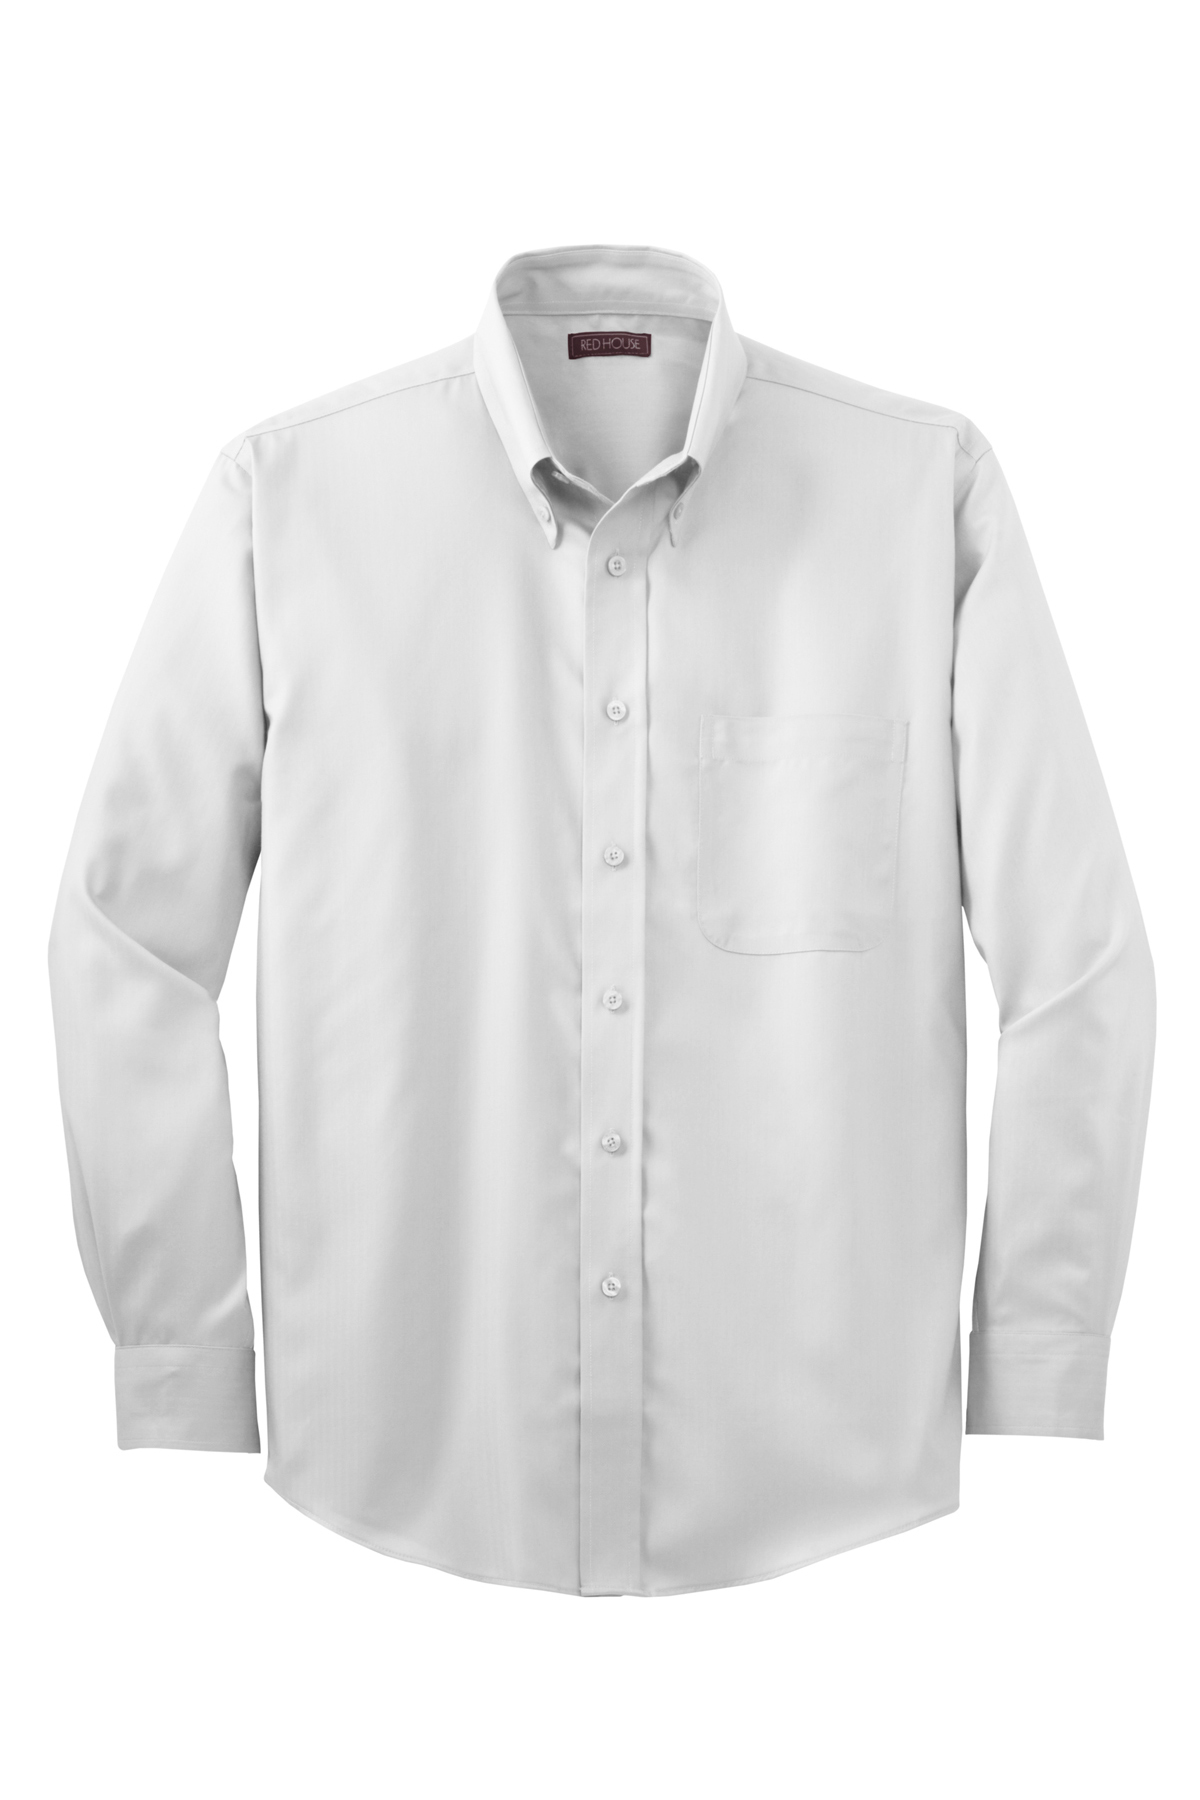 4741bb7b Red House® - Herringbone Non-Iron Button-Down Shirt   Cotton ...